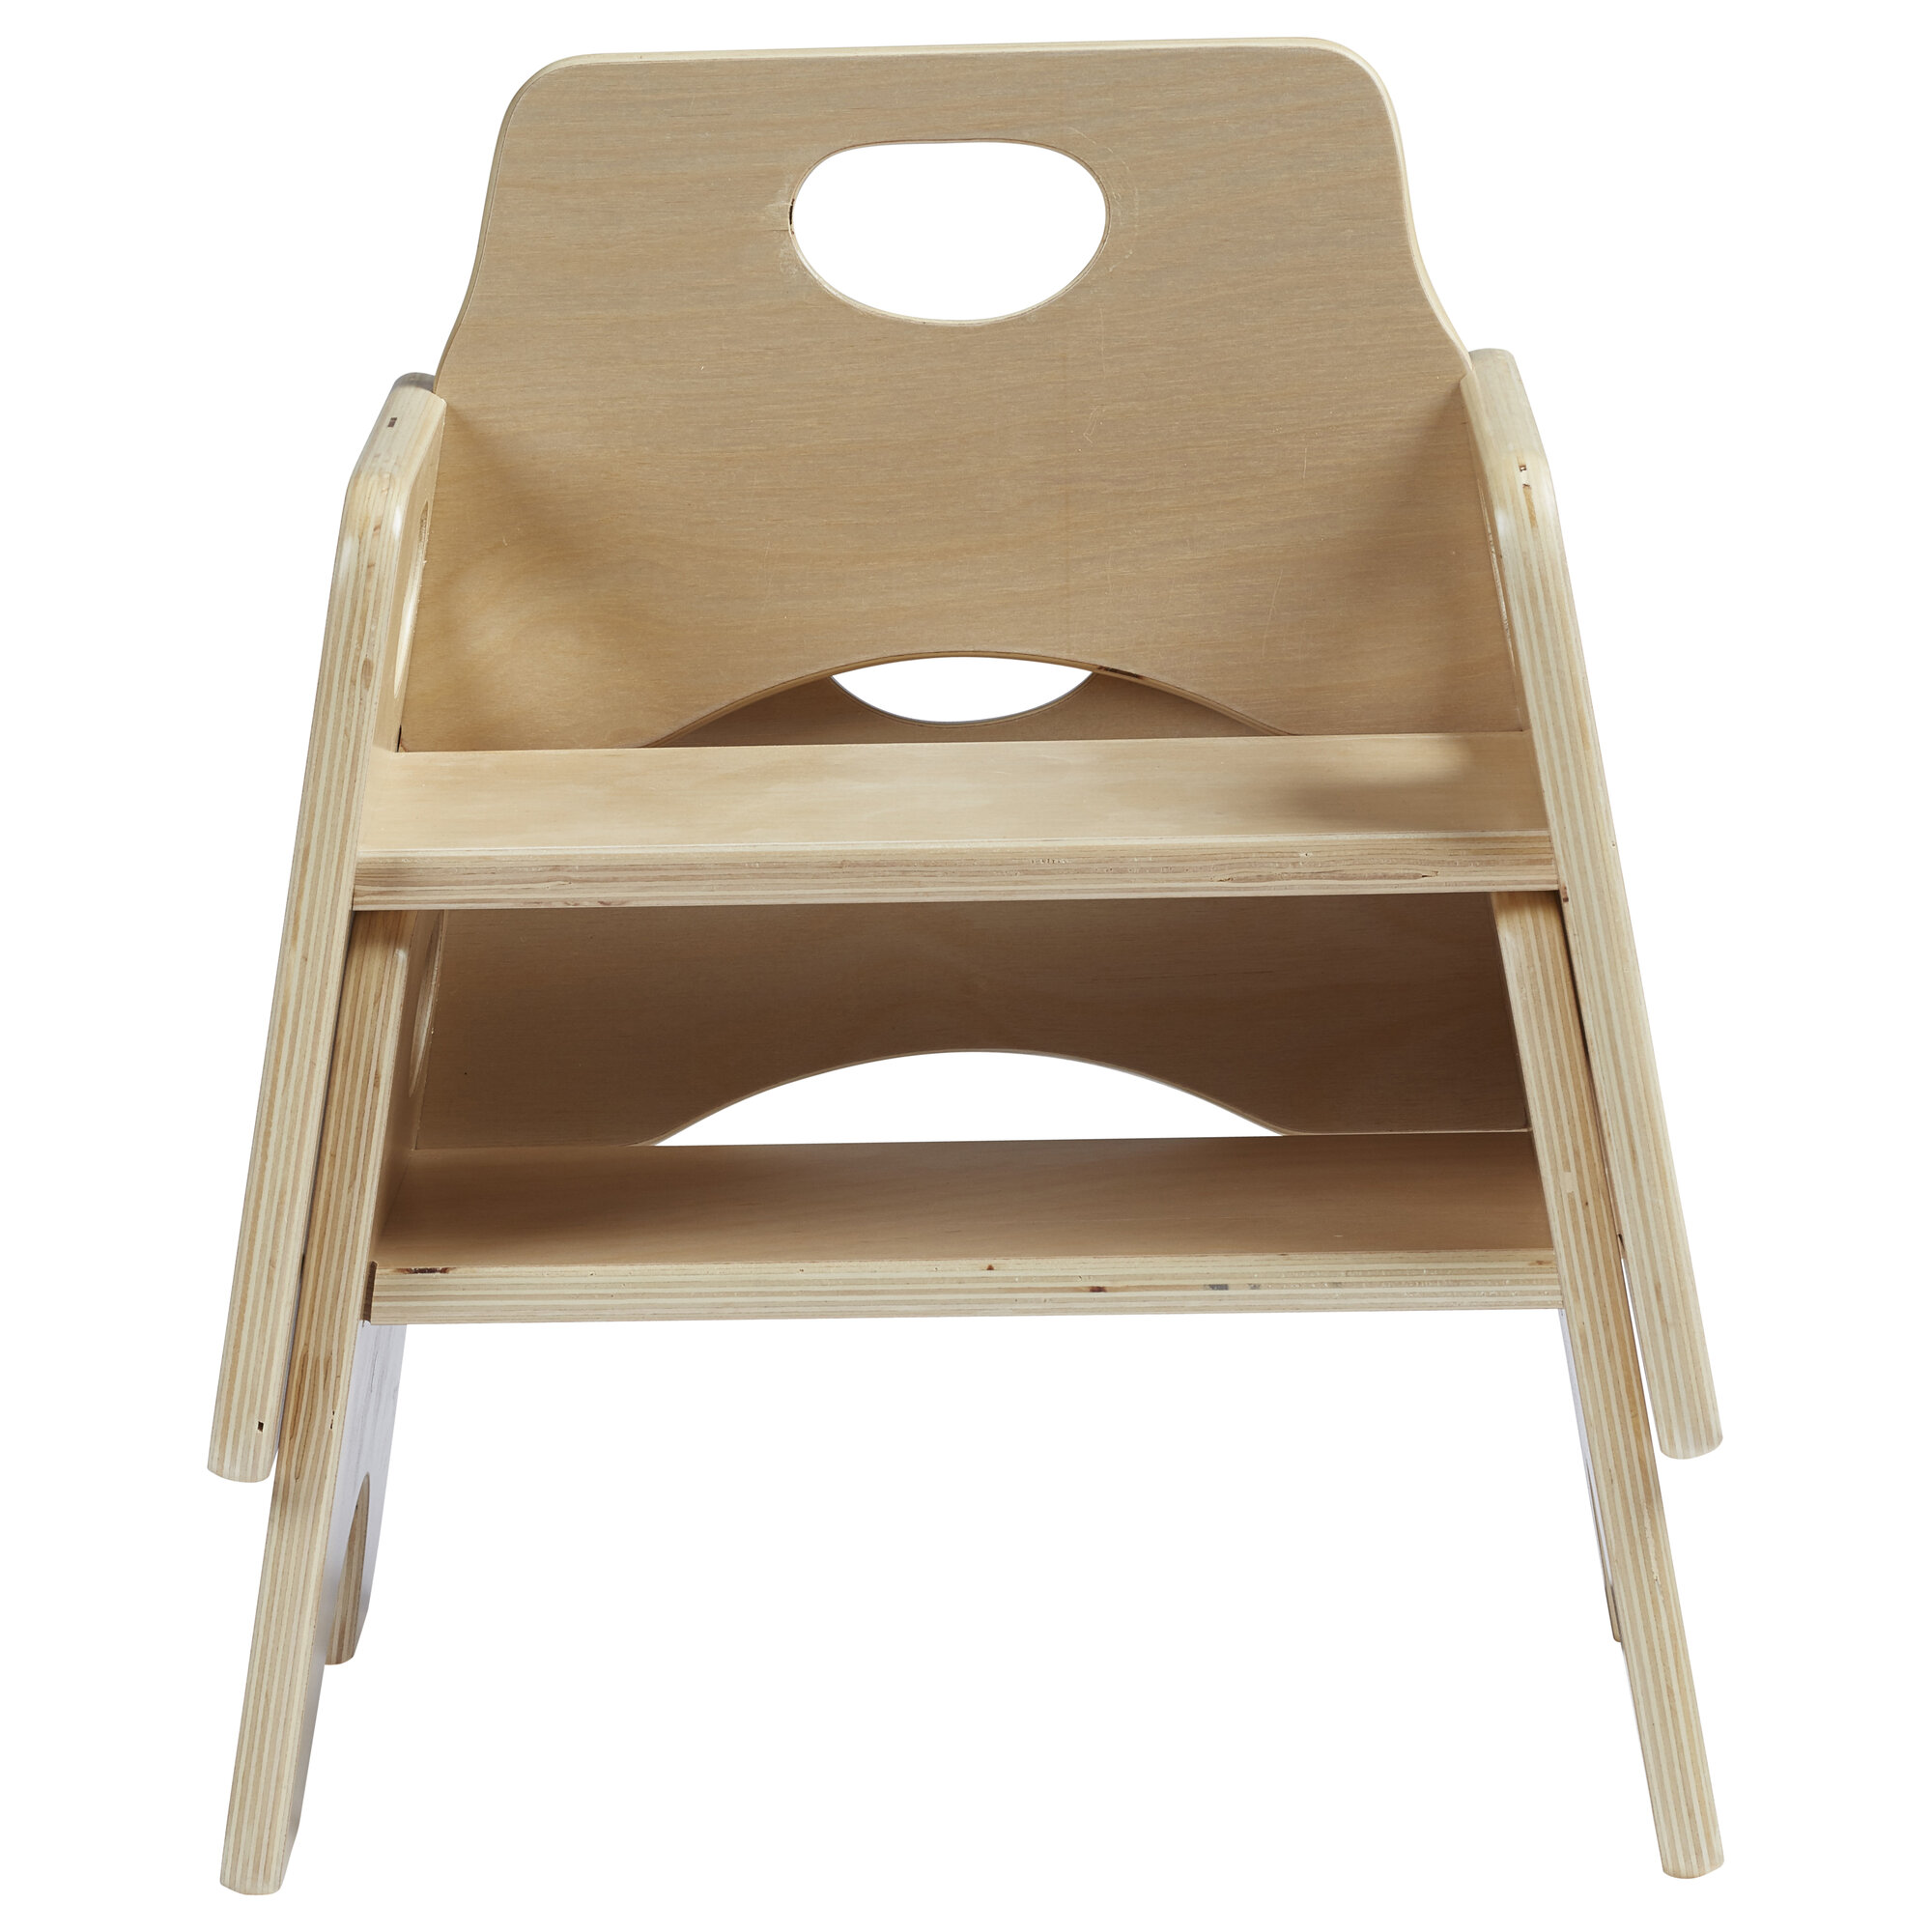 Perfect ECR4kids Wooden Kids Novelty Chair Set Of 2